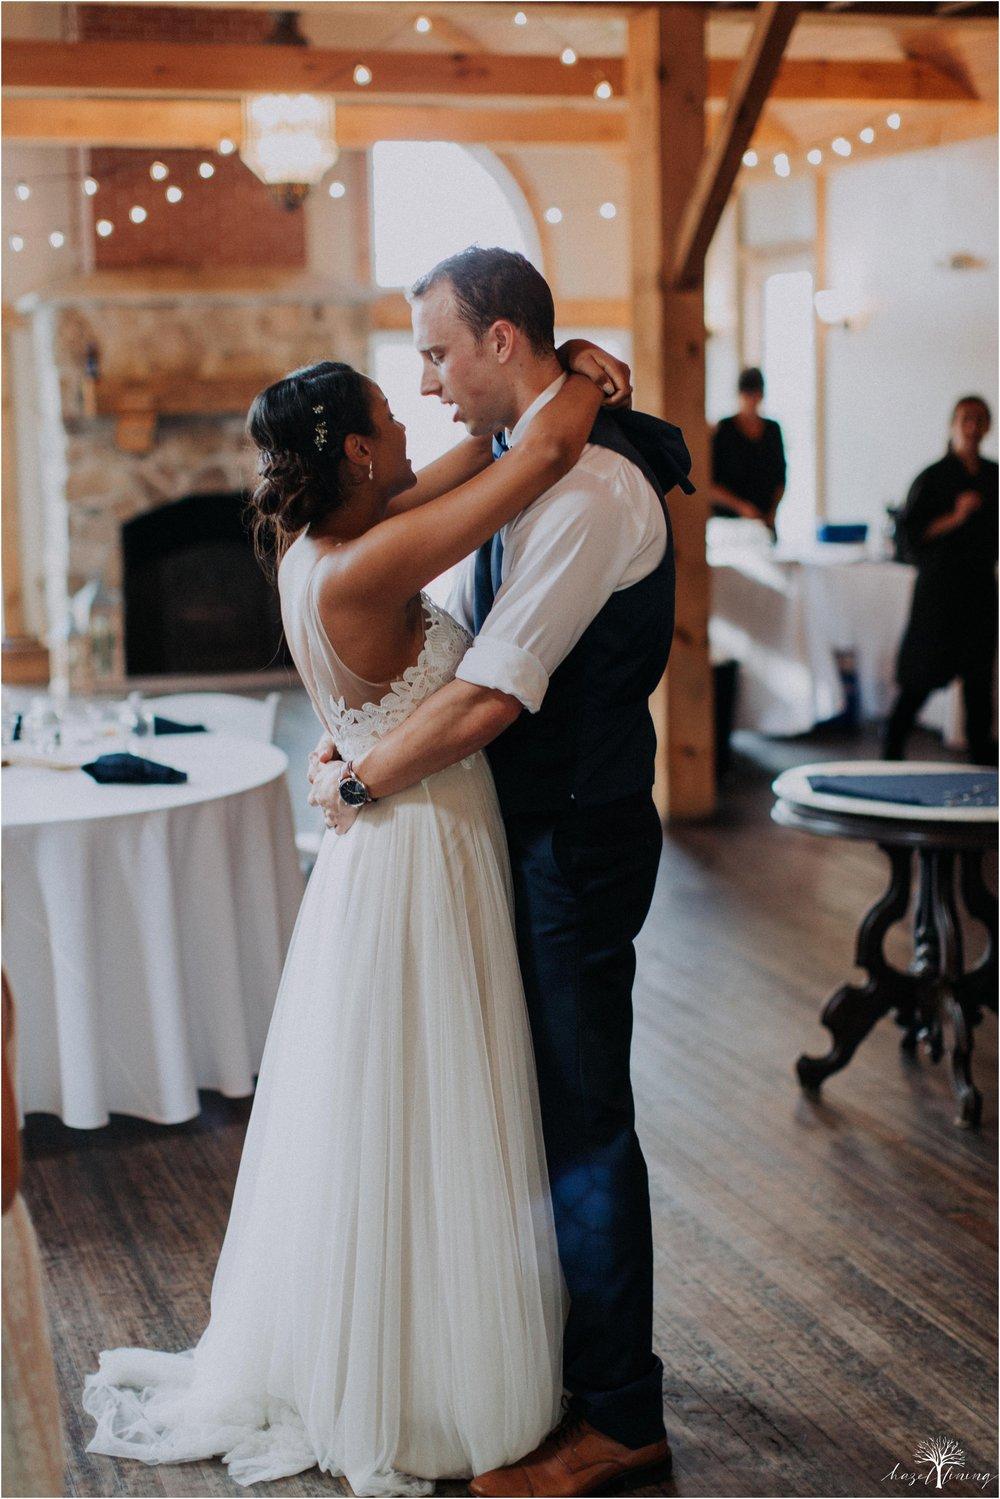 mariah-kreyling-samuel-sherratt-sherrattwiththeworld-peirce-farm-at-witch-hill-boston-massachusetts-wedding-photography-hazel-lining-travel-wedding-elopement-photography_0188.jpg